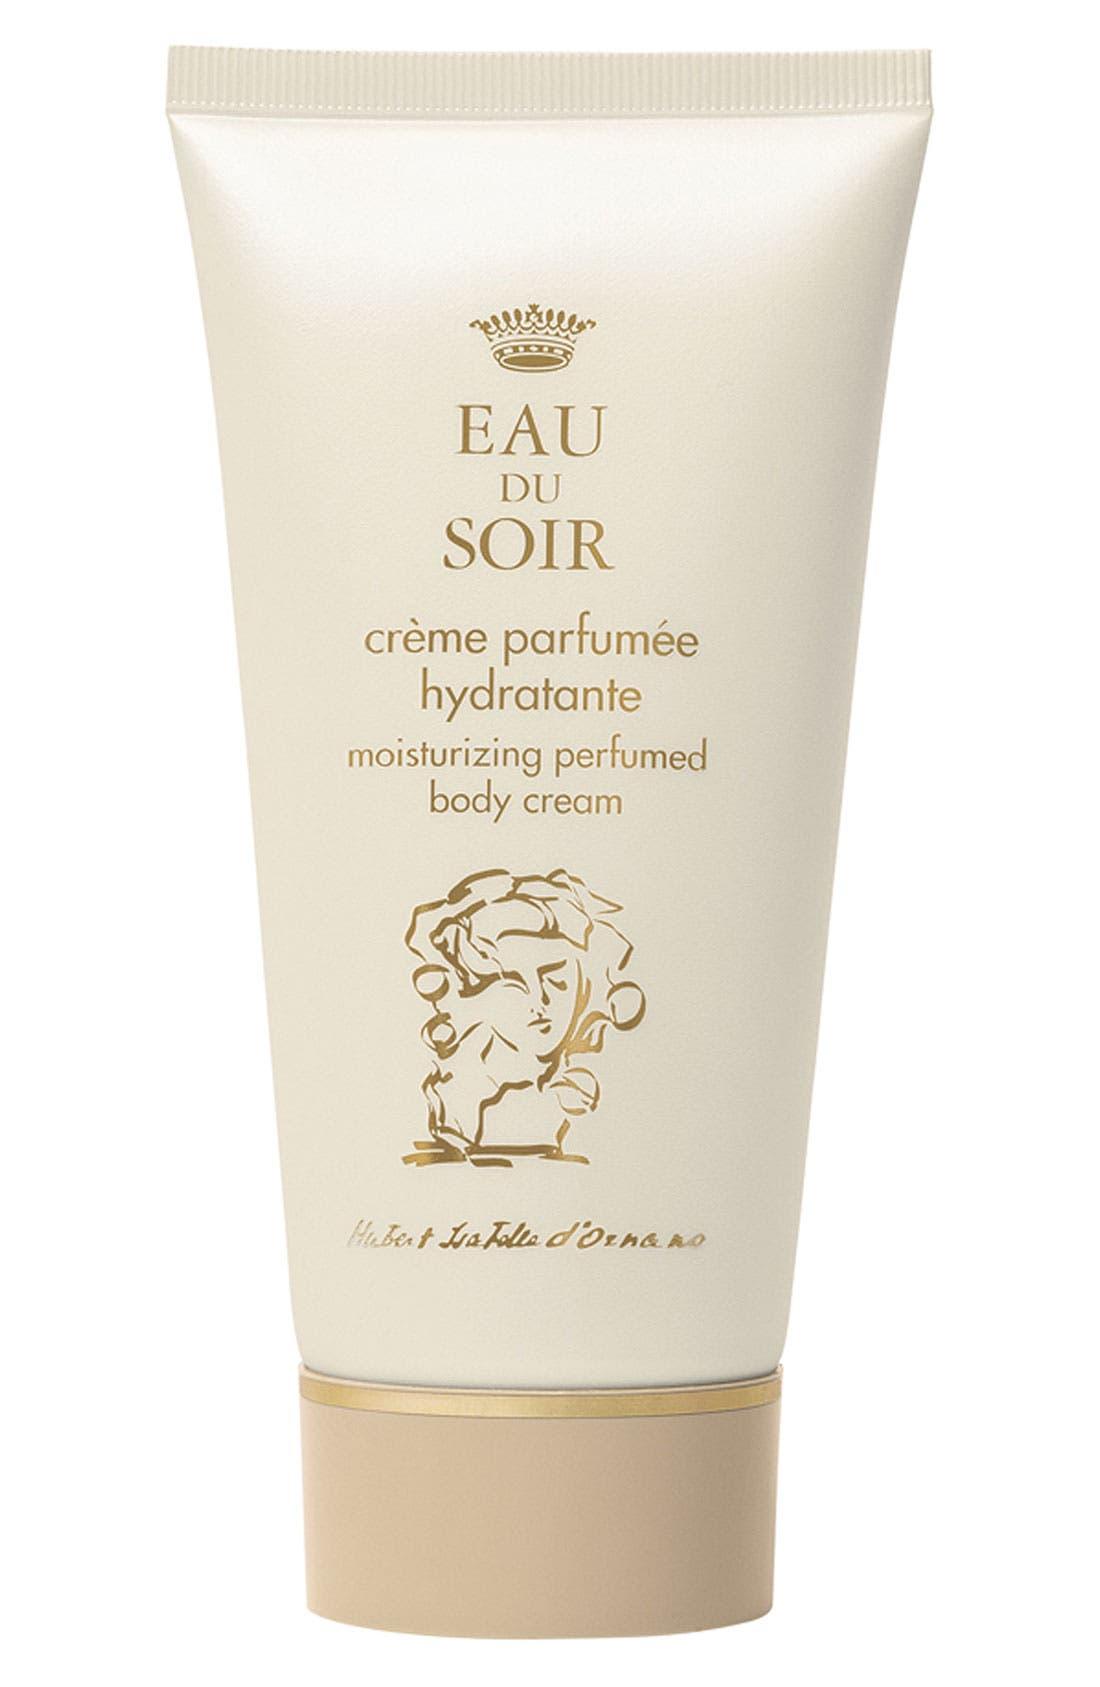 SISLEY PARIS,                             Eau du Soir Moisturizing Perfumed Body Cream,                             Main thumbnail 1, color,                             NONE